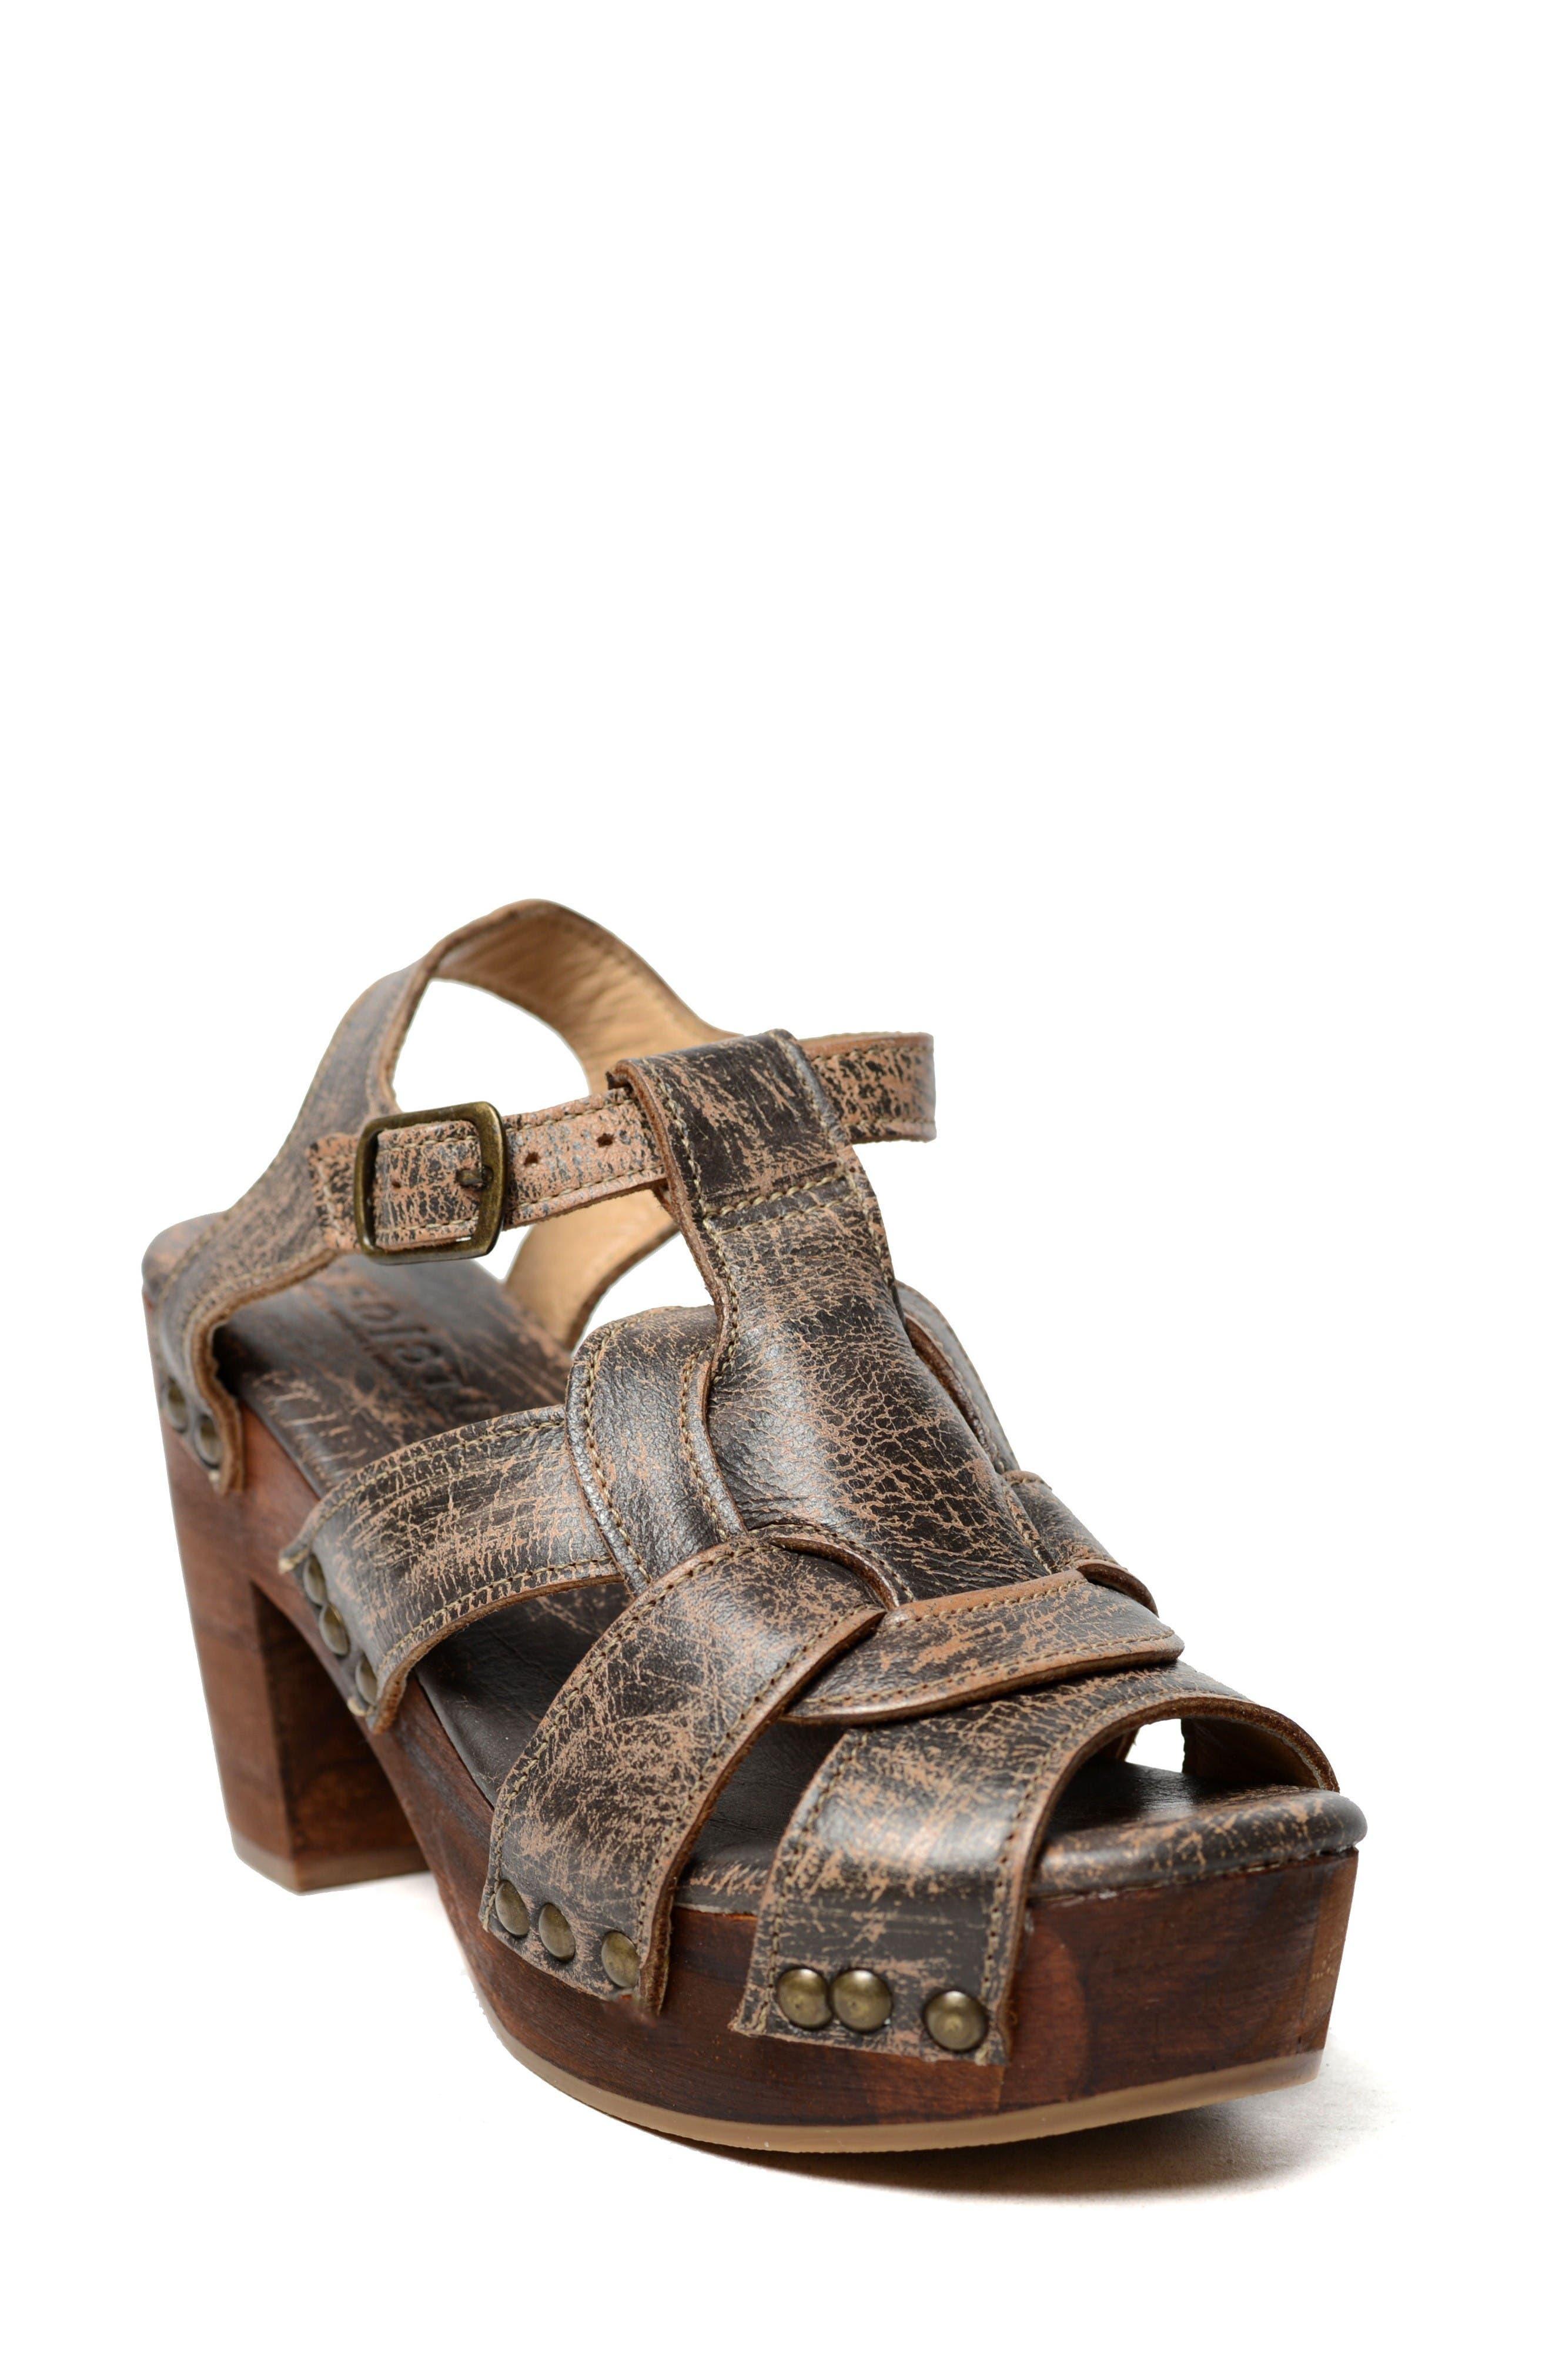 Alternate Image 1 Selected - Bed Stu Caitlin Block Heel Sandal (Women)